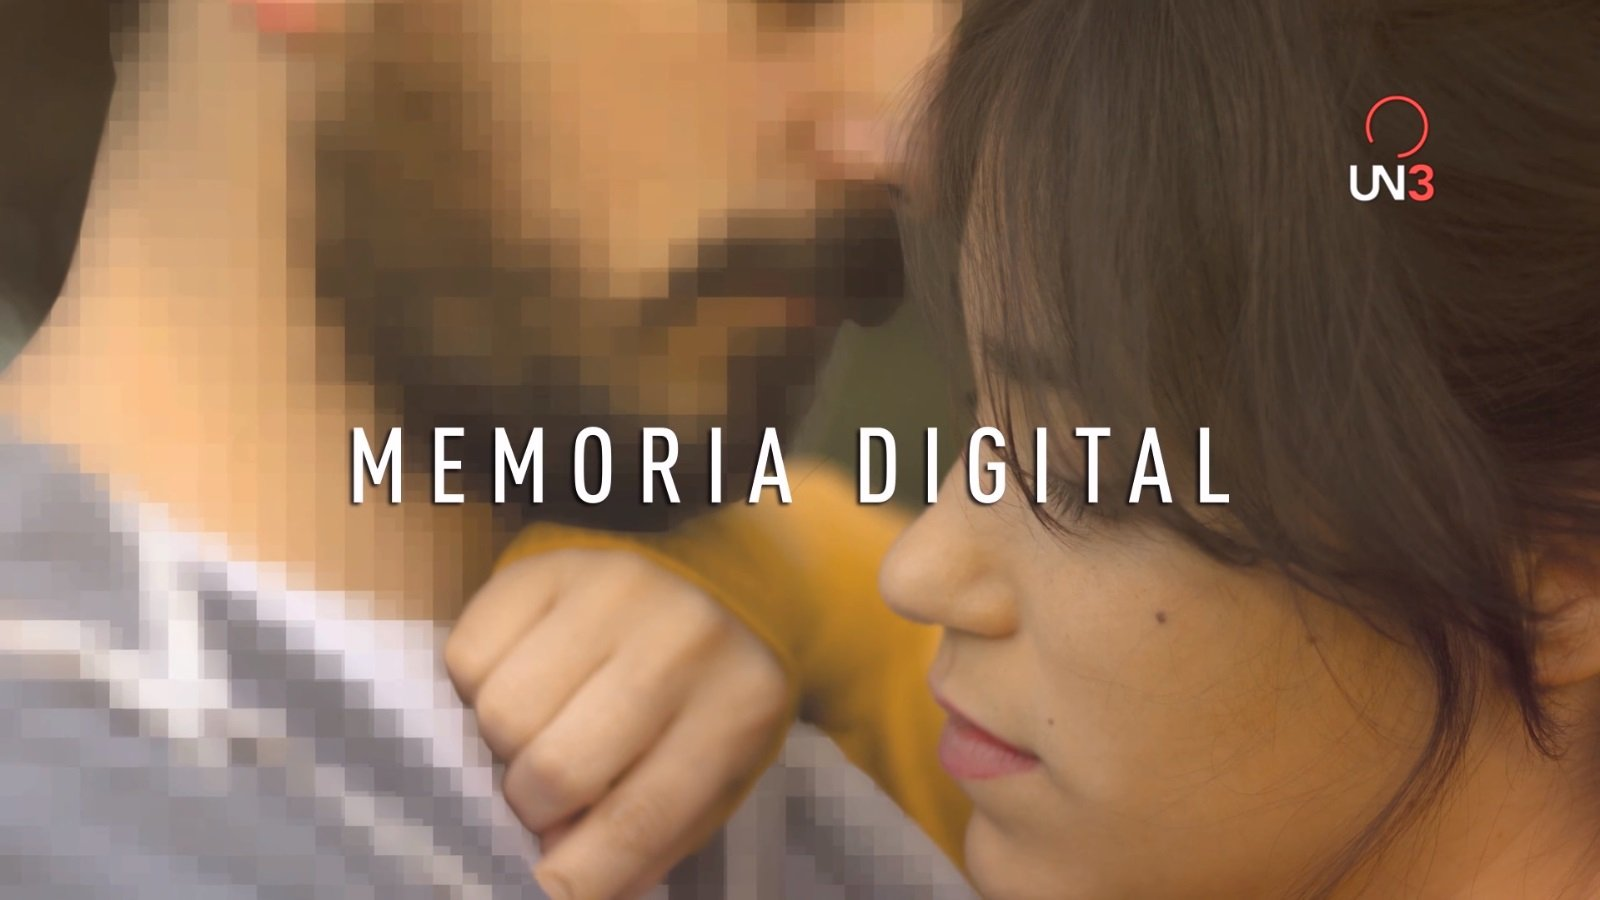 Roma Web Fest - MEMORIA DIGITAL // DIGITAL MEMORY